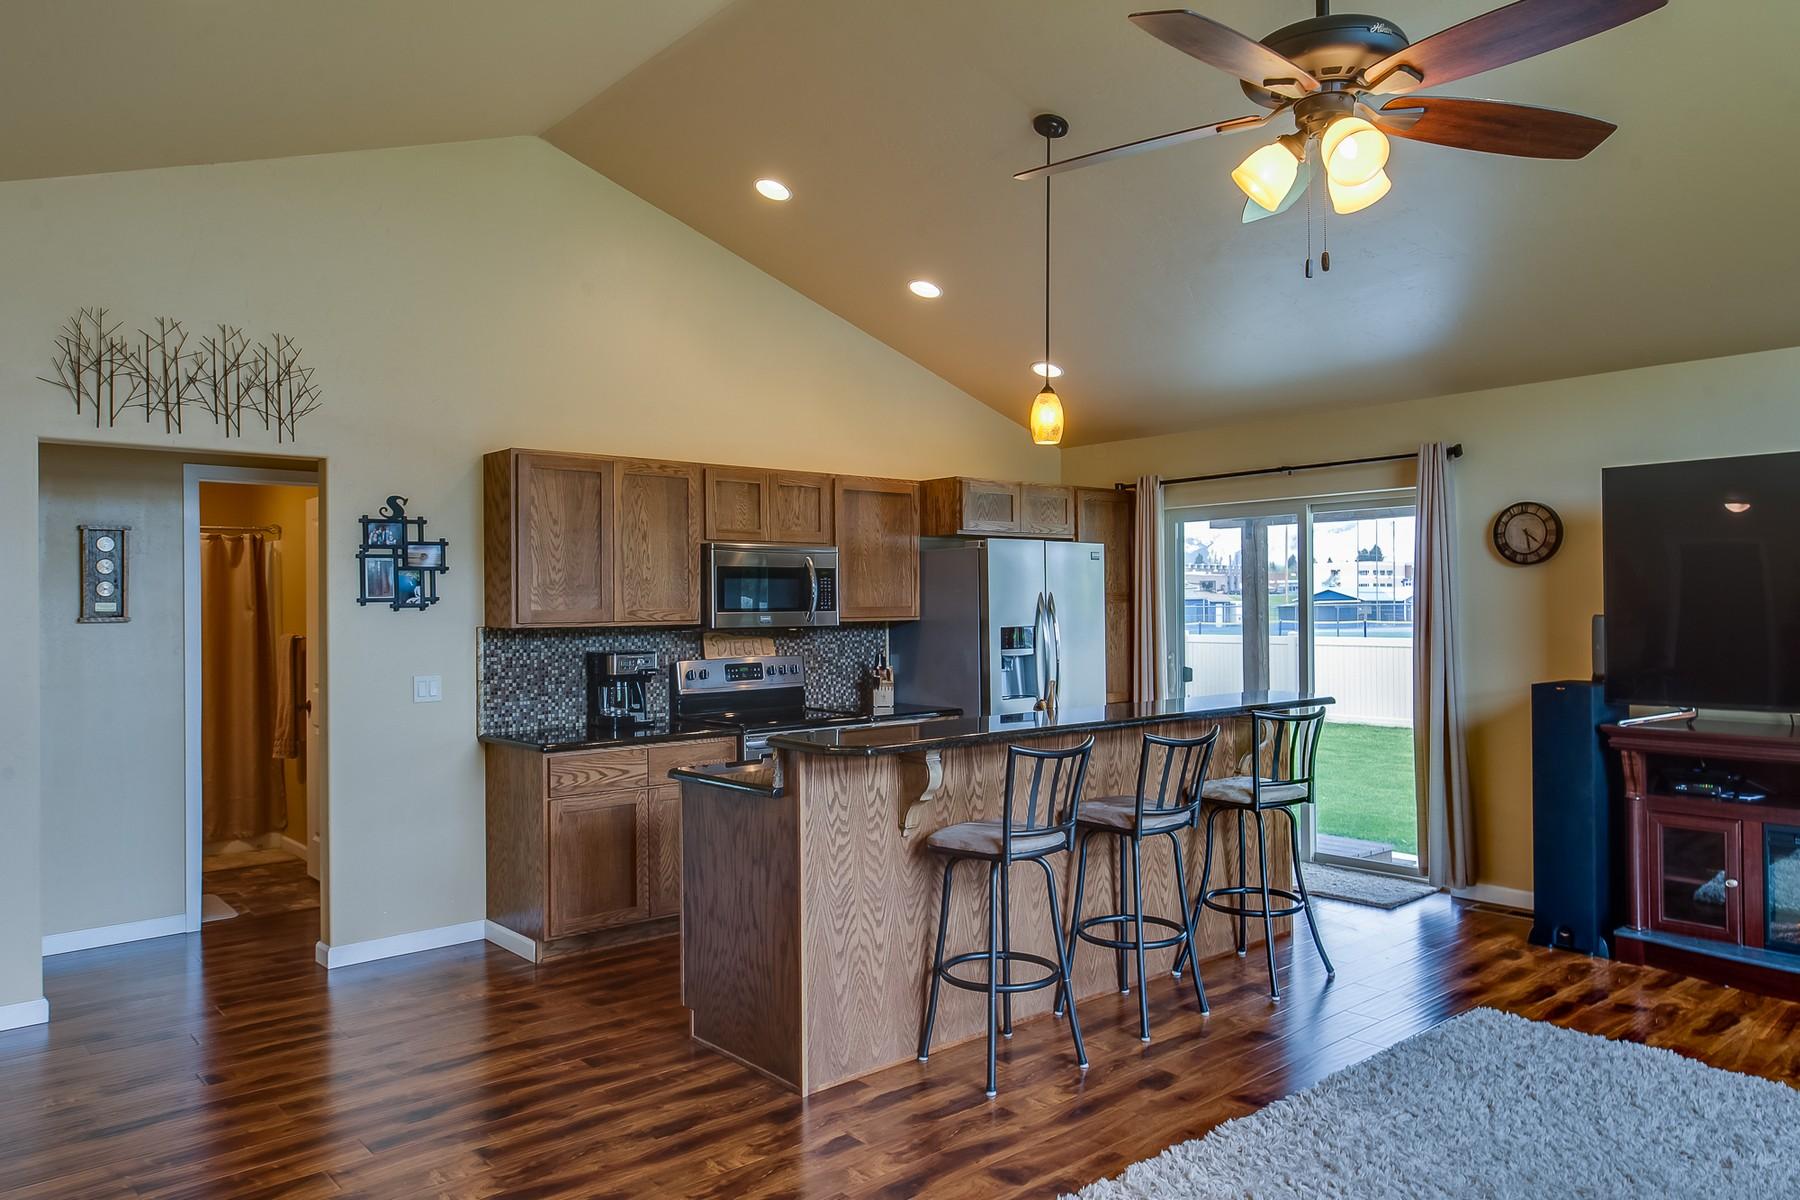 Additional photo for property listing at 3 Hidden Cedar Loop , Columbia Falls, MT 59912 3  Hidden Cedar Loop Columbia Falls, Montana 59912 United States